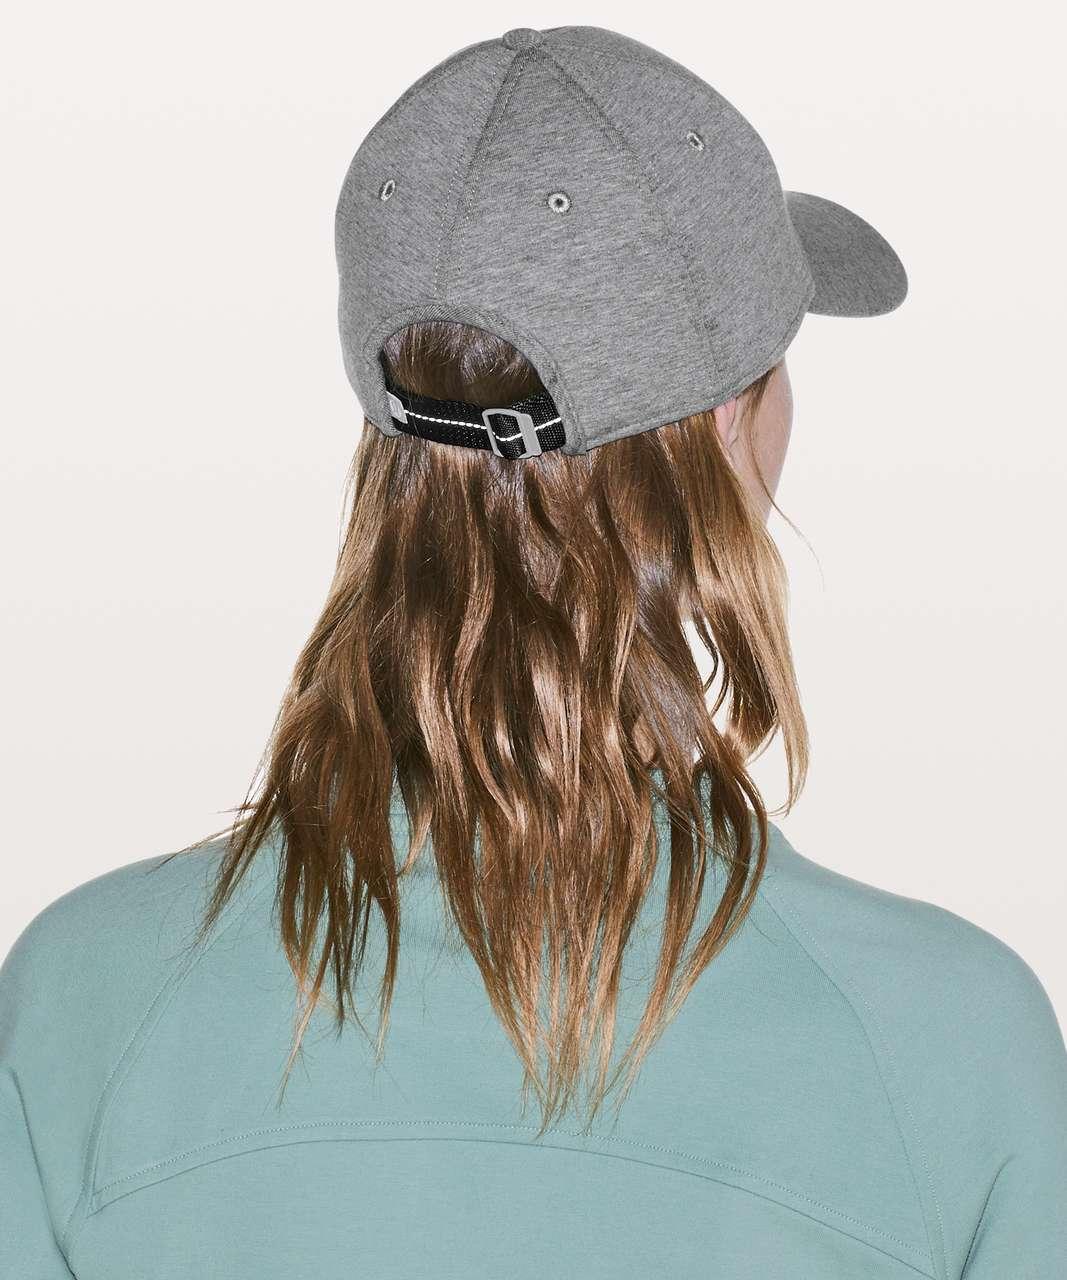 Lululemon Baller Hat - Heathered Medium Grey / Black